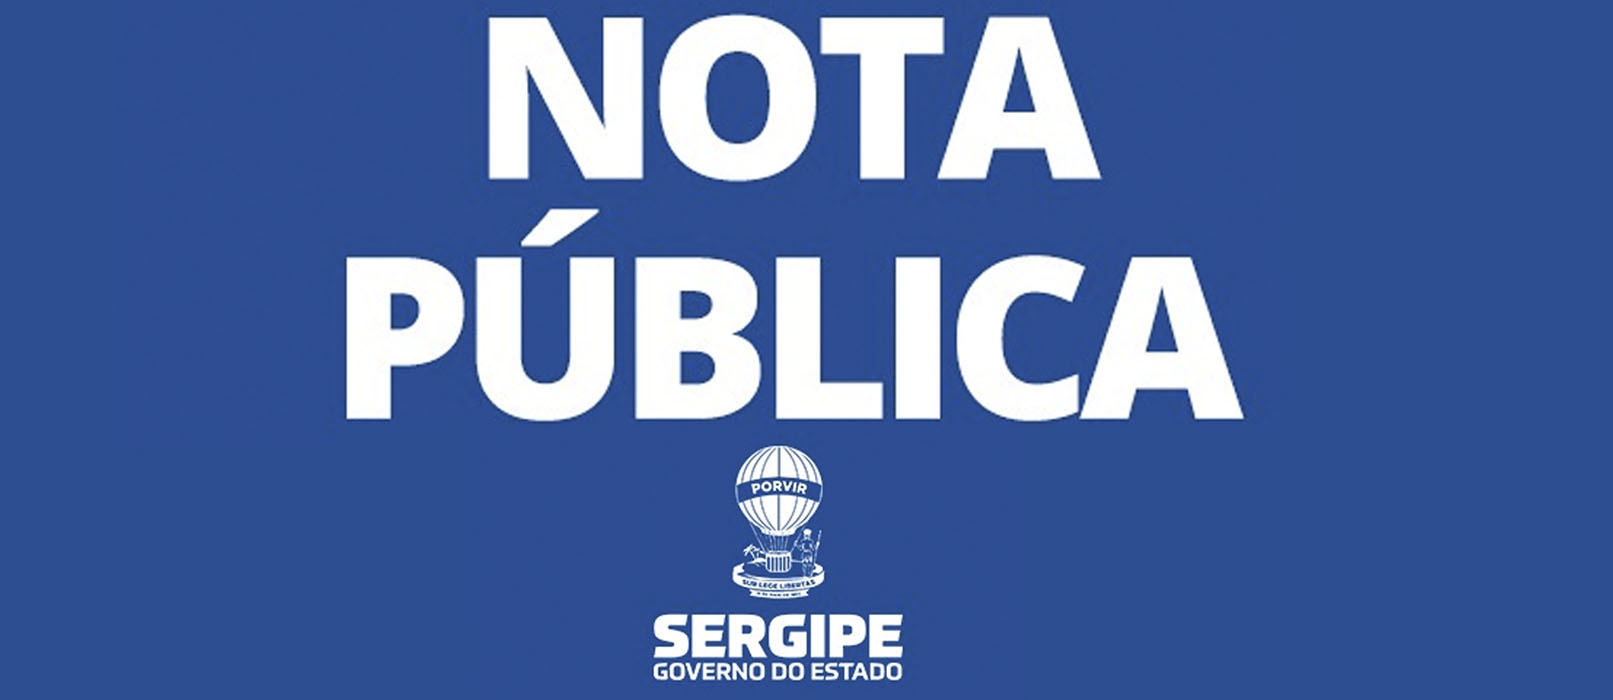 NotaPublica.jpg